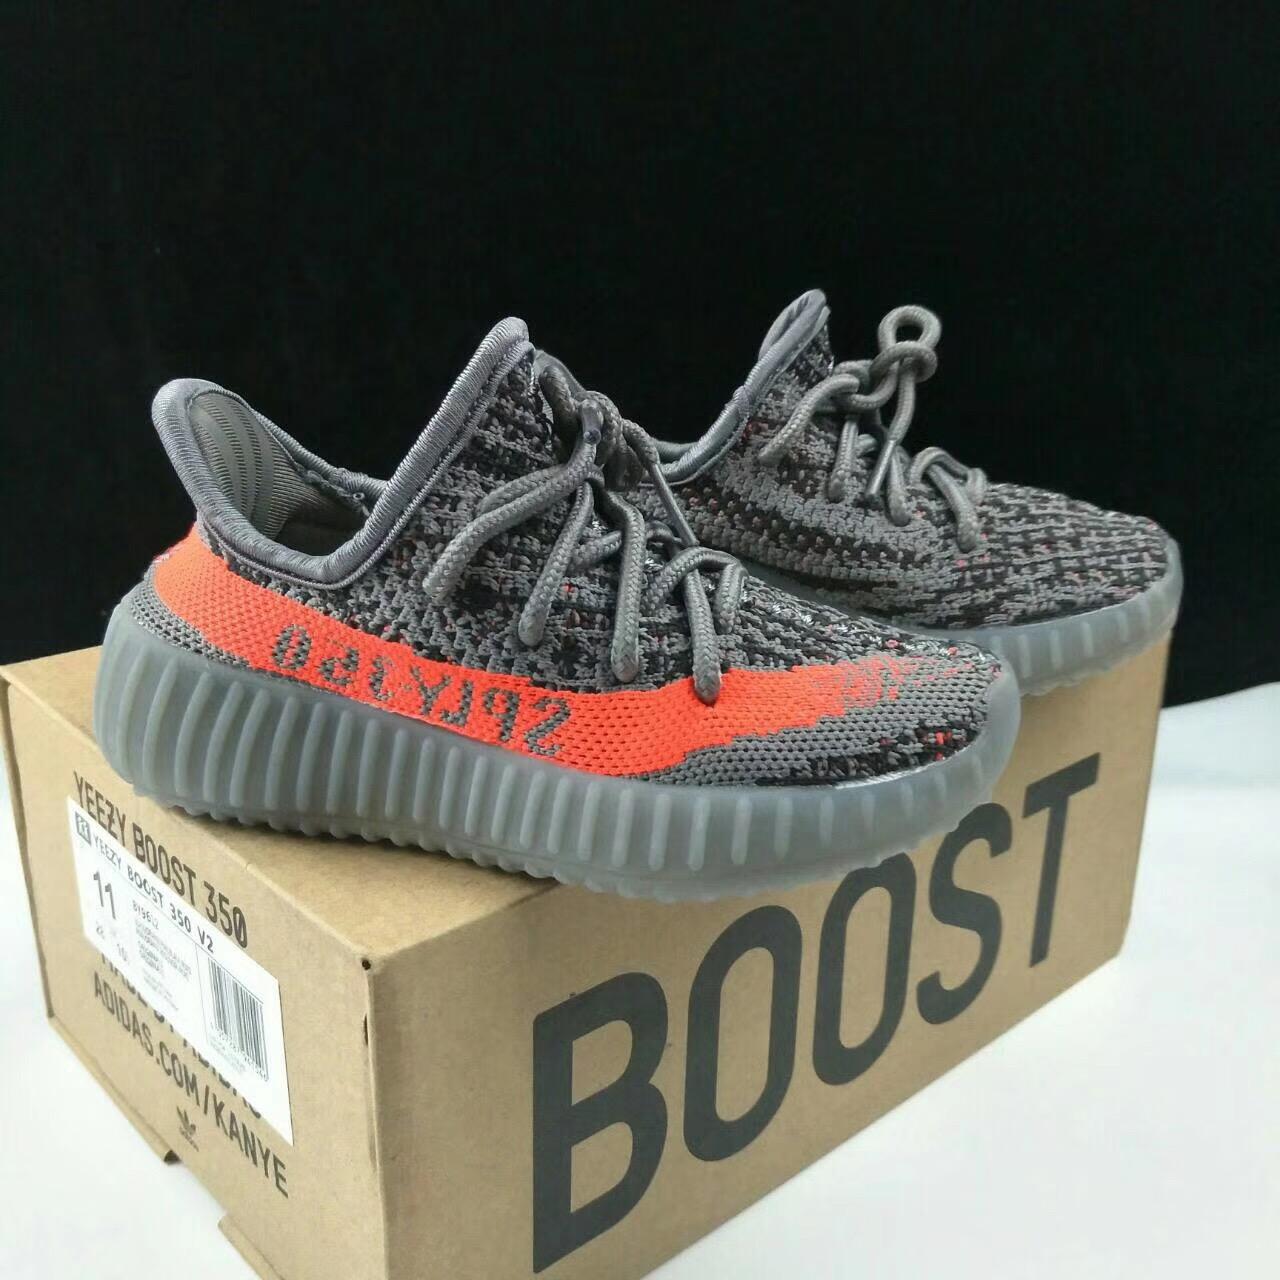 Giày adidas YEEZY BOOST 350 v2 Sply